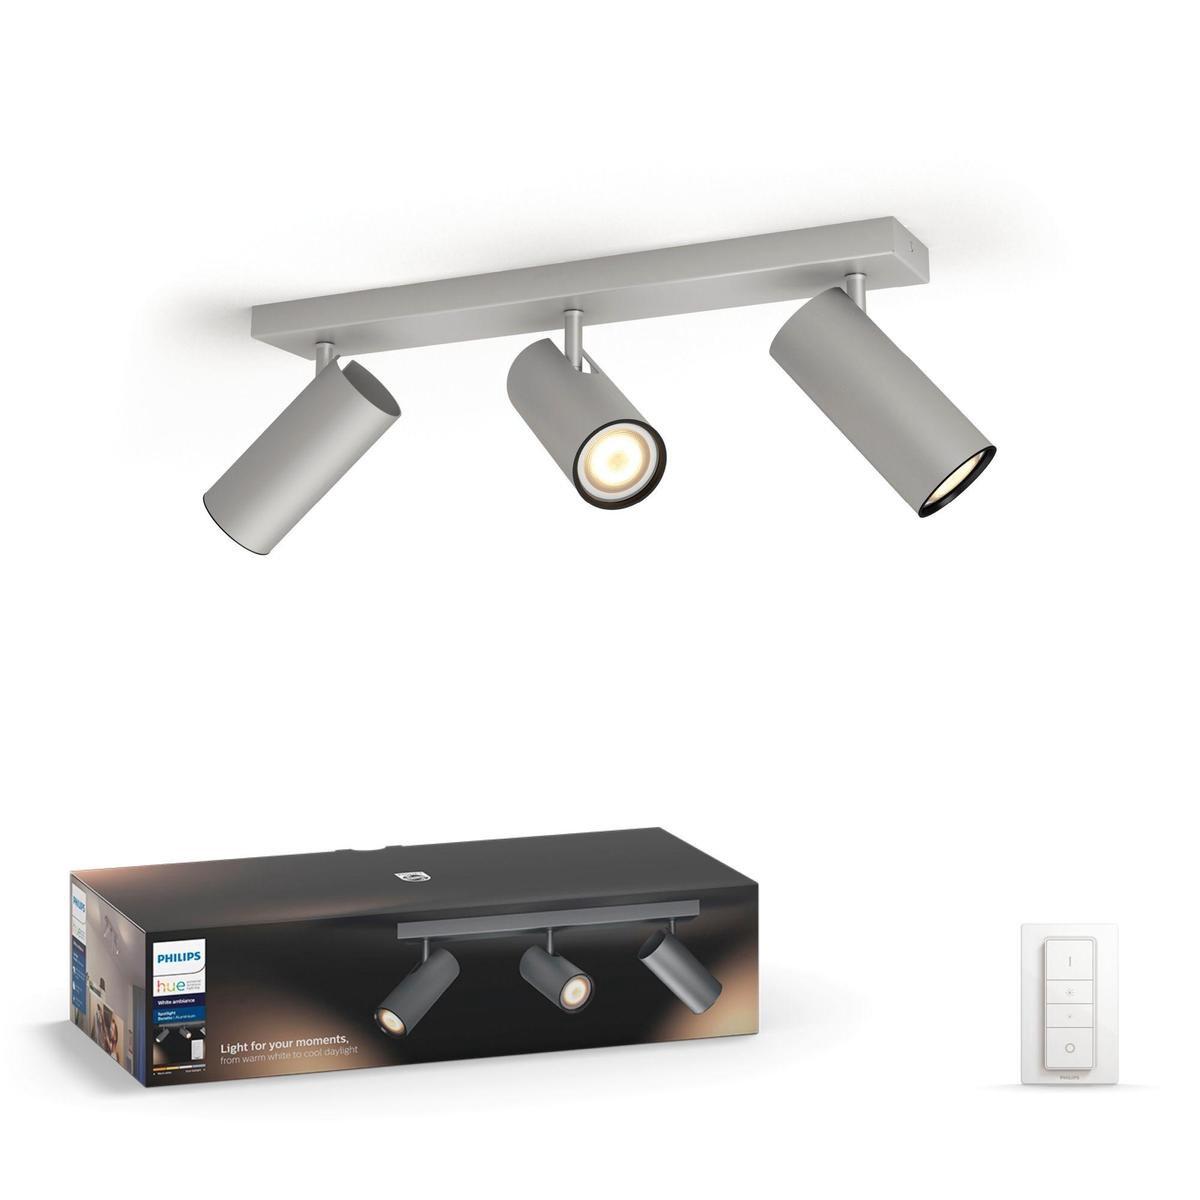 Philips Hue Buratto - White Ambiance - opbouwspot - 3 lichtpunten - aluminium - incl DIM switch